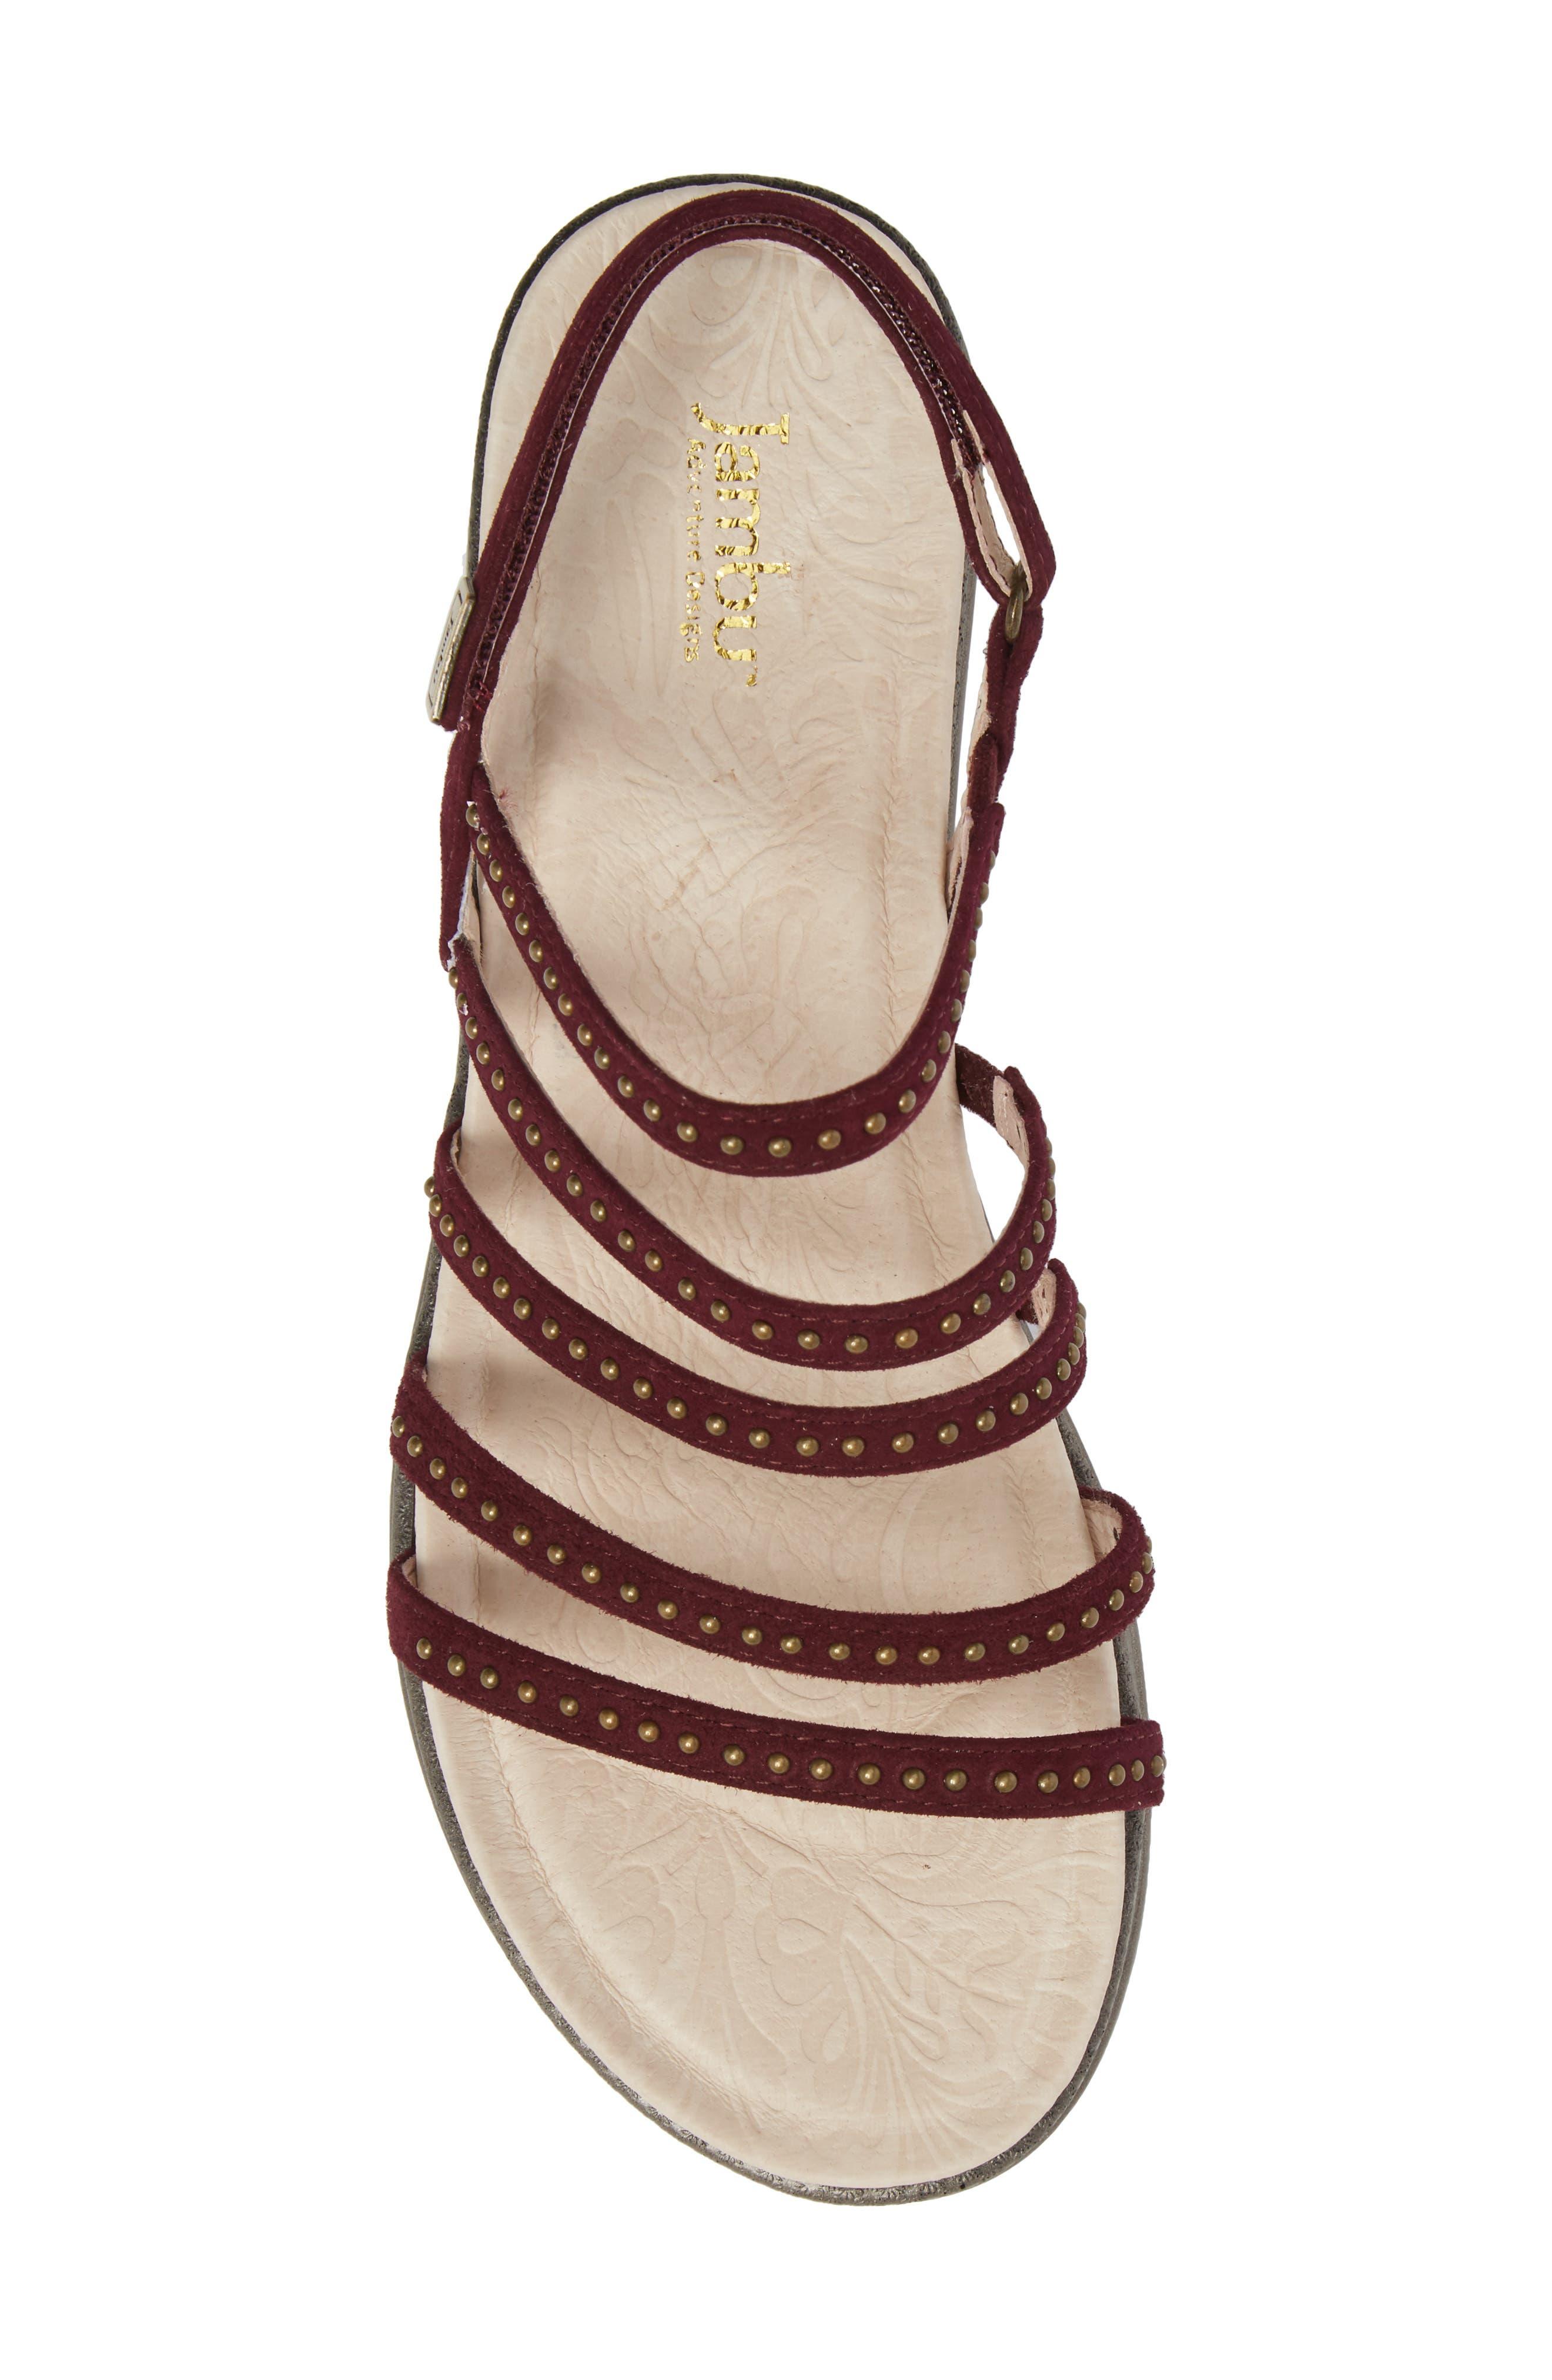 Elegance Studded Strappy Sandal,                             Alternate thumbnail 5, color,                             WINE SUEDE